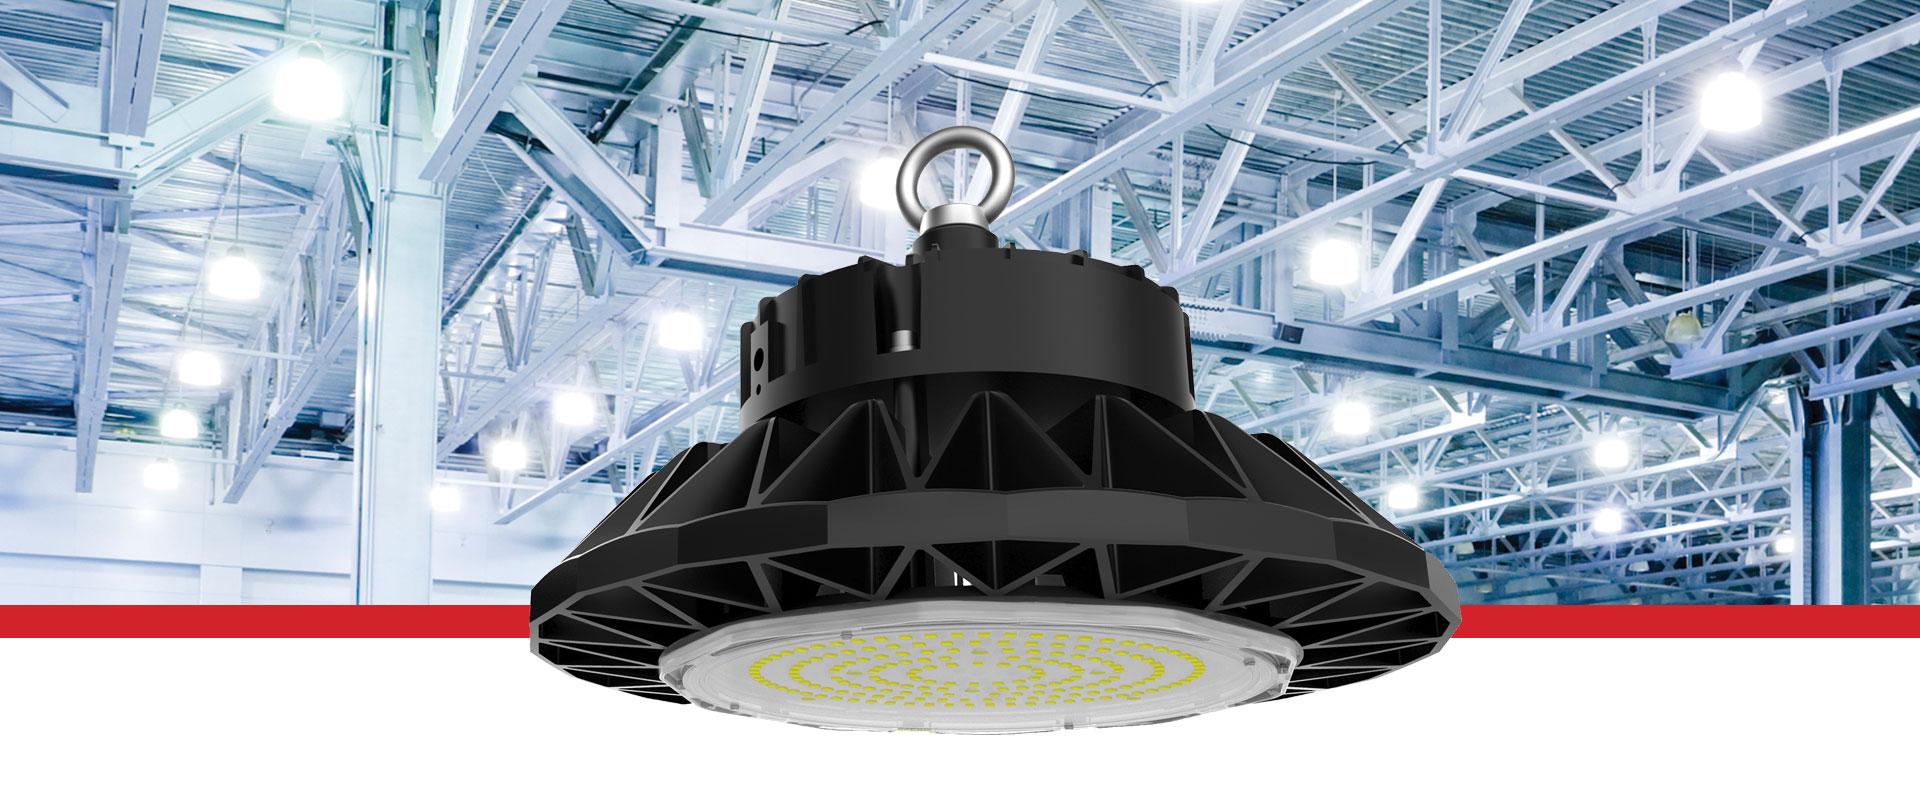 Saturn Magic LED Highbay